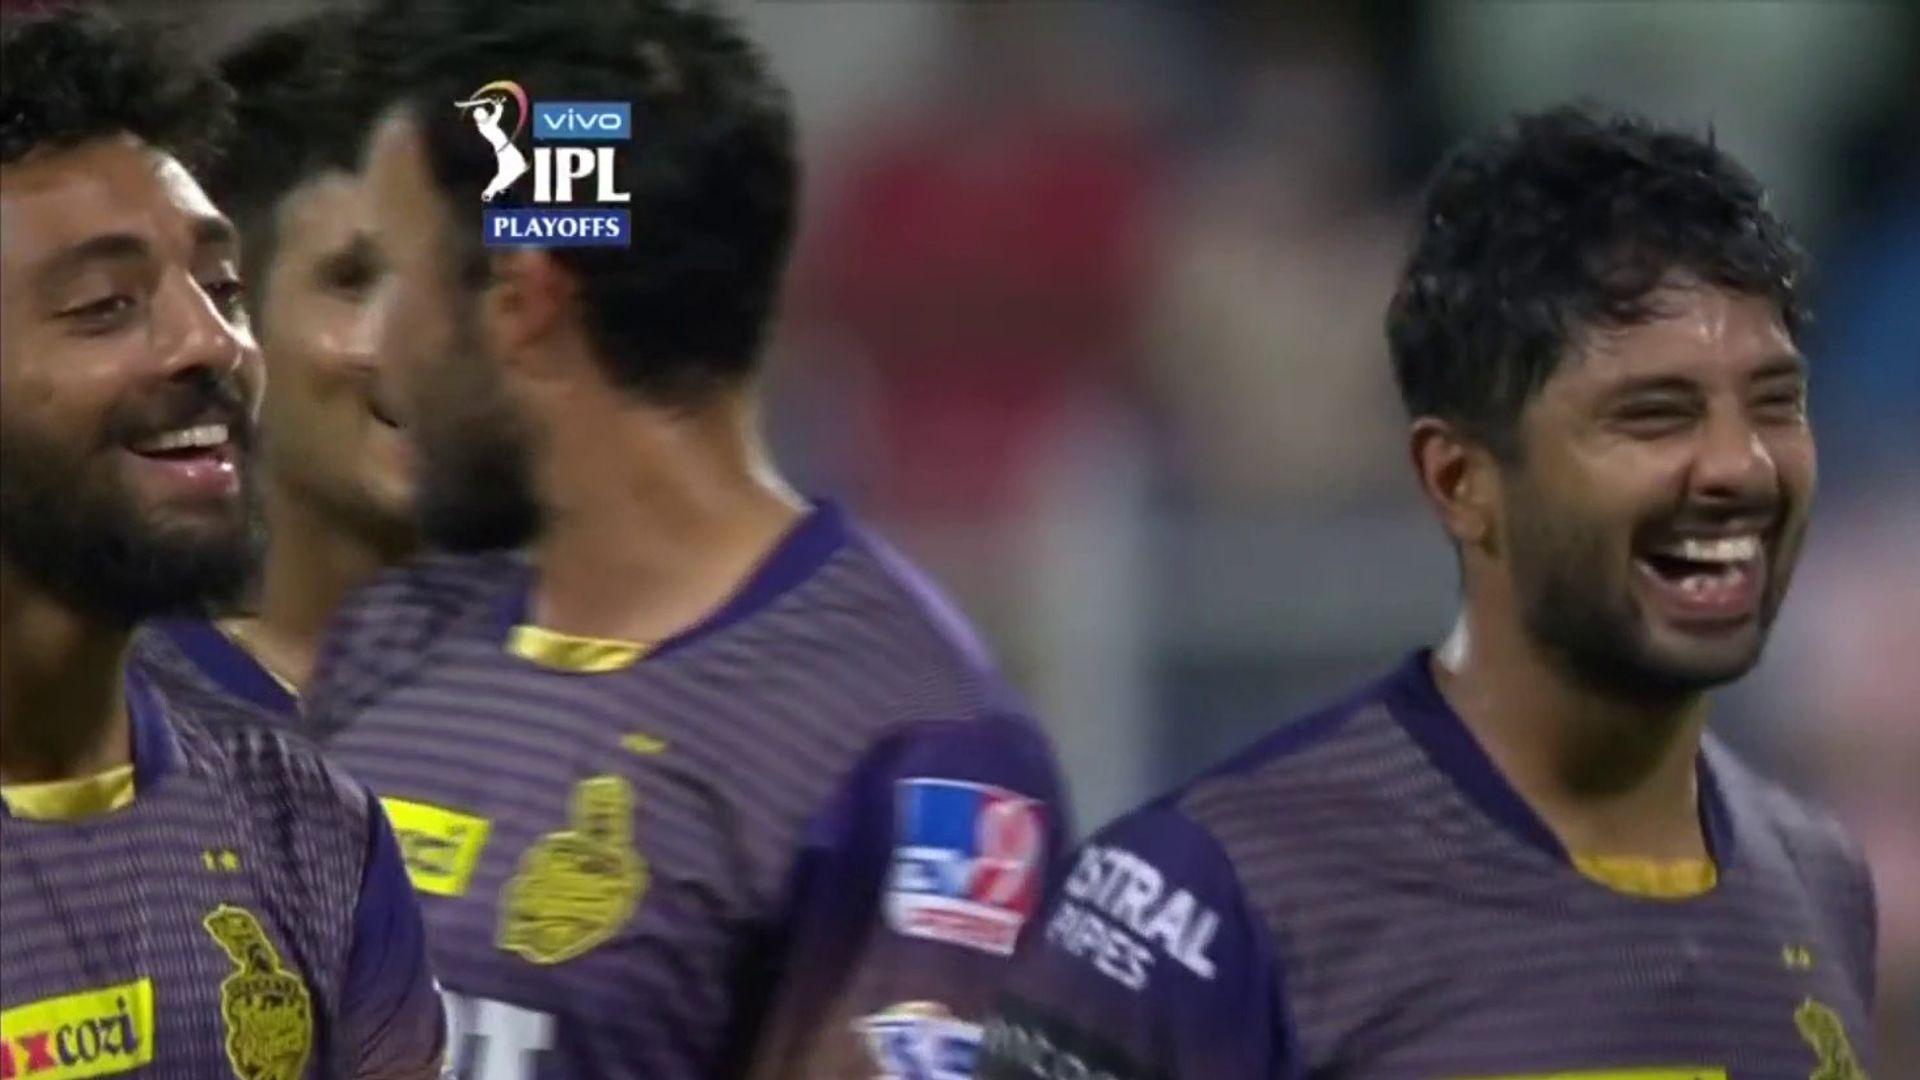 Morgan's Kolkata into IPL final despite dramatic collapse